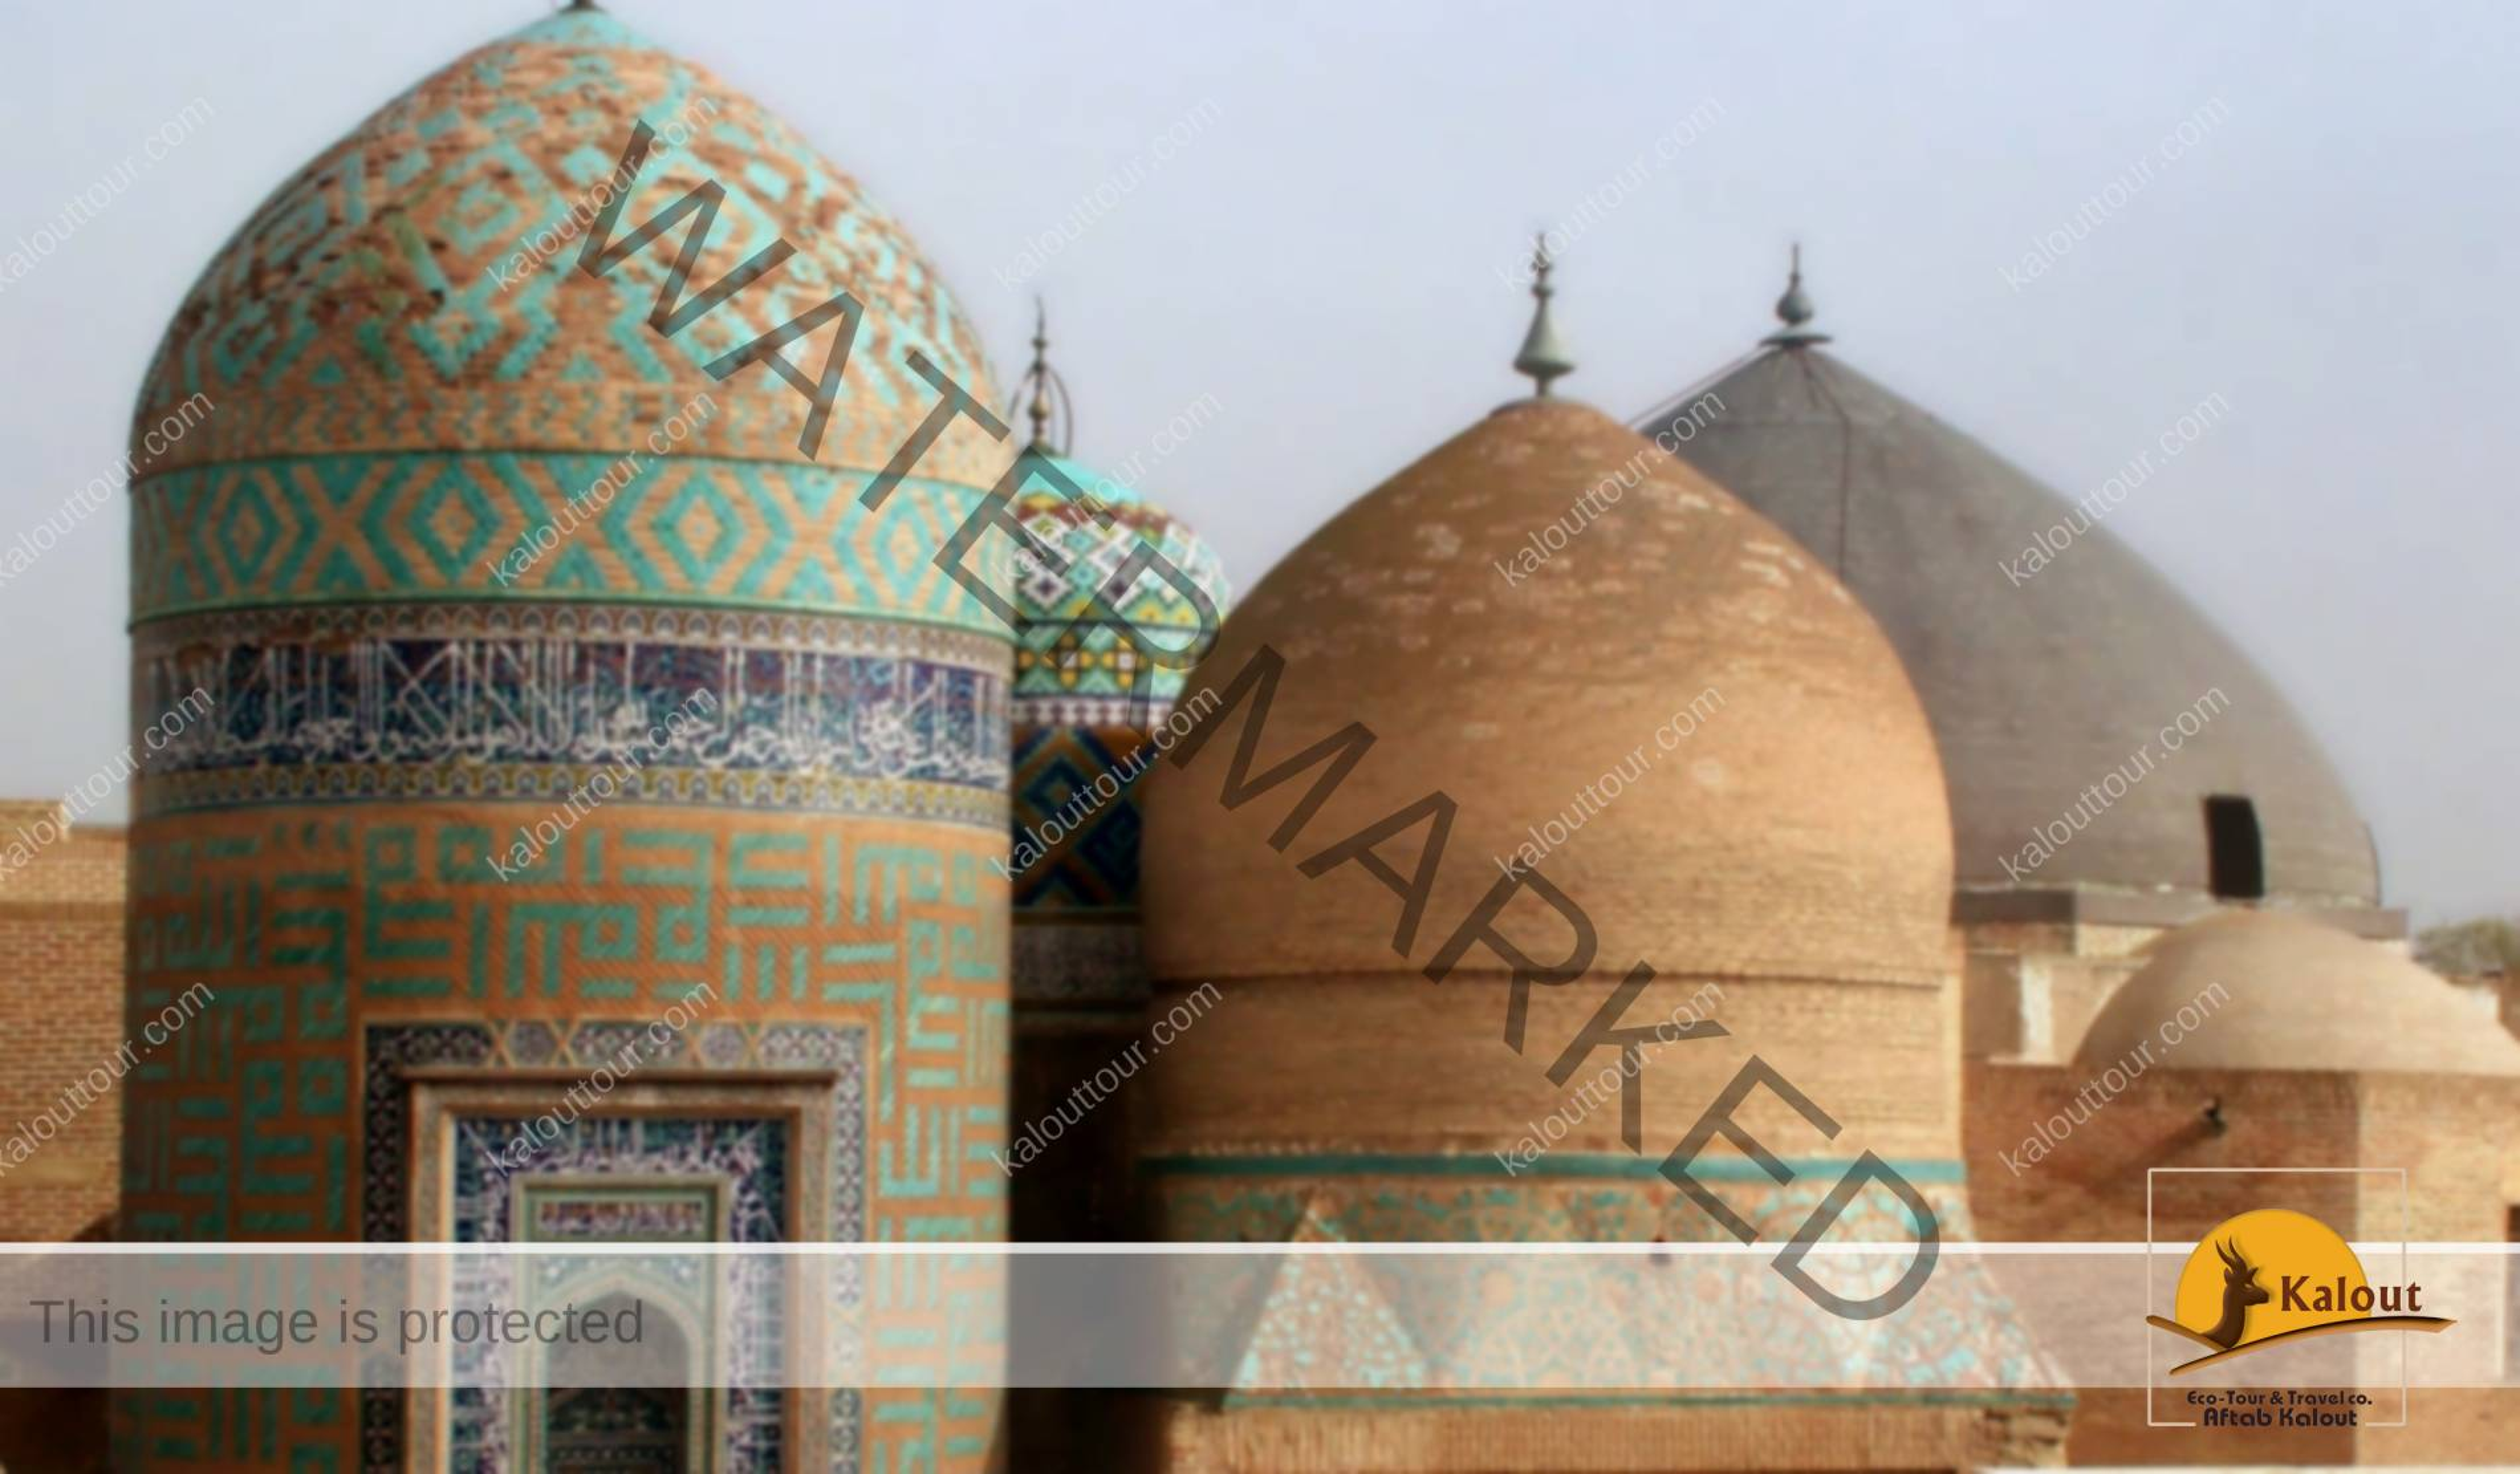 safiodin-ardebili Iran World Heritage Sites Uncategorized Iran World Heritage Sites Iran Culture